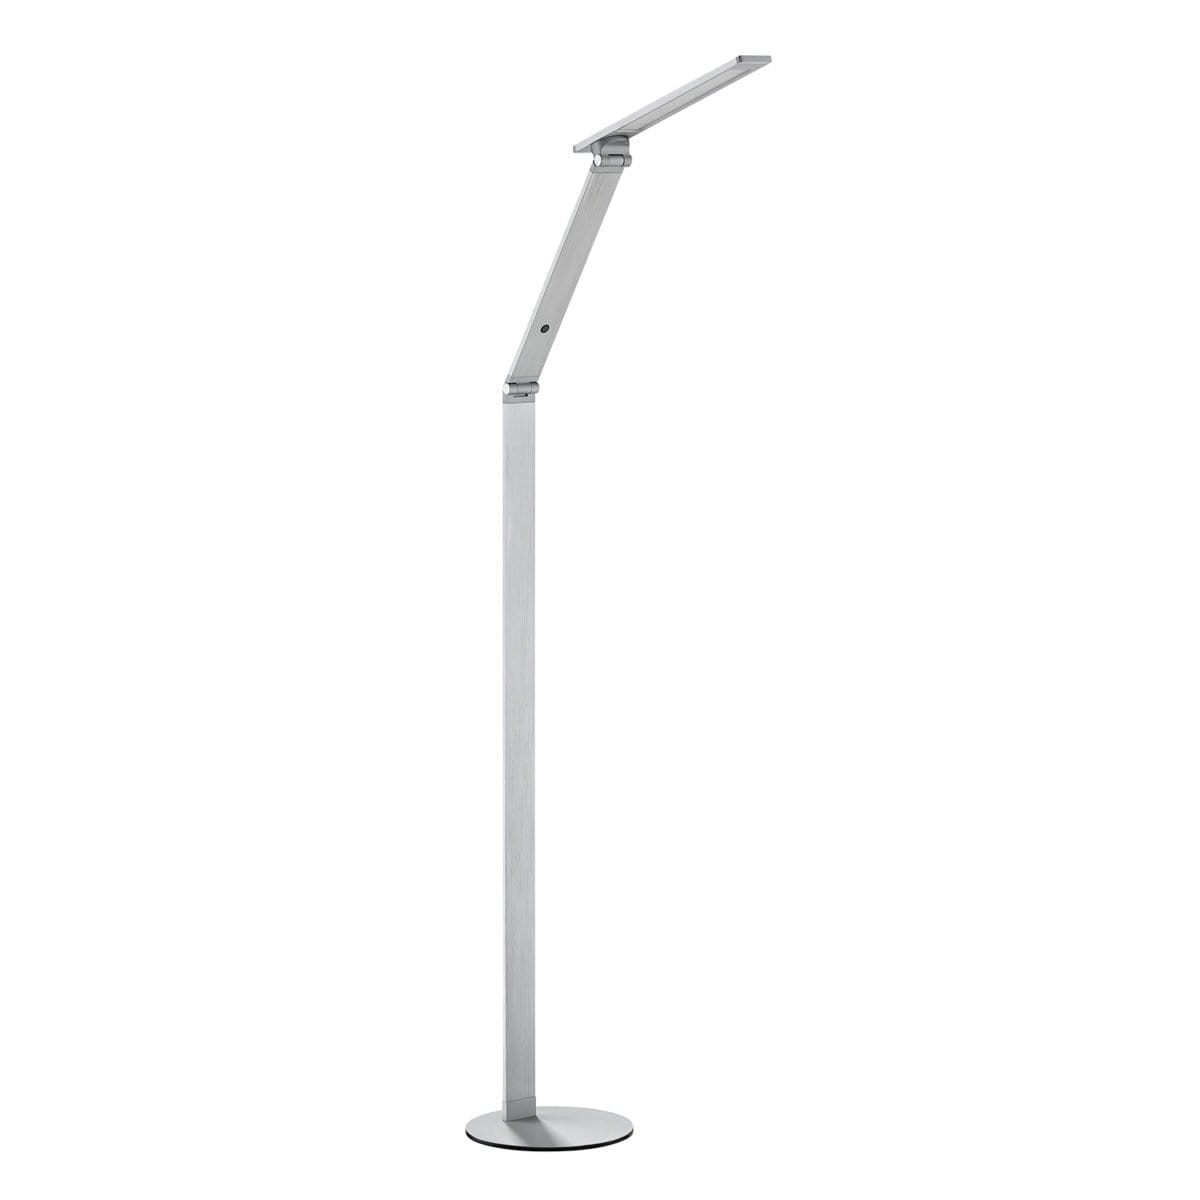 148 FL5002 BA LED Floor Lamp availible in Brushed Aluminum, Black, or Russet Bronze Regular Price $453.99 Sale Price $317.99